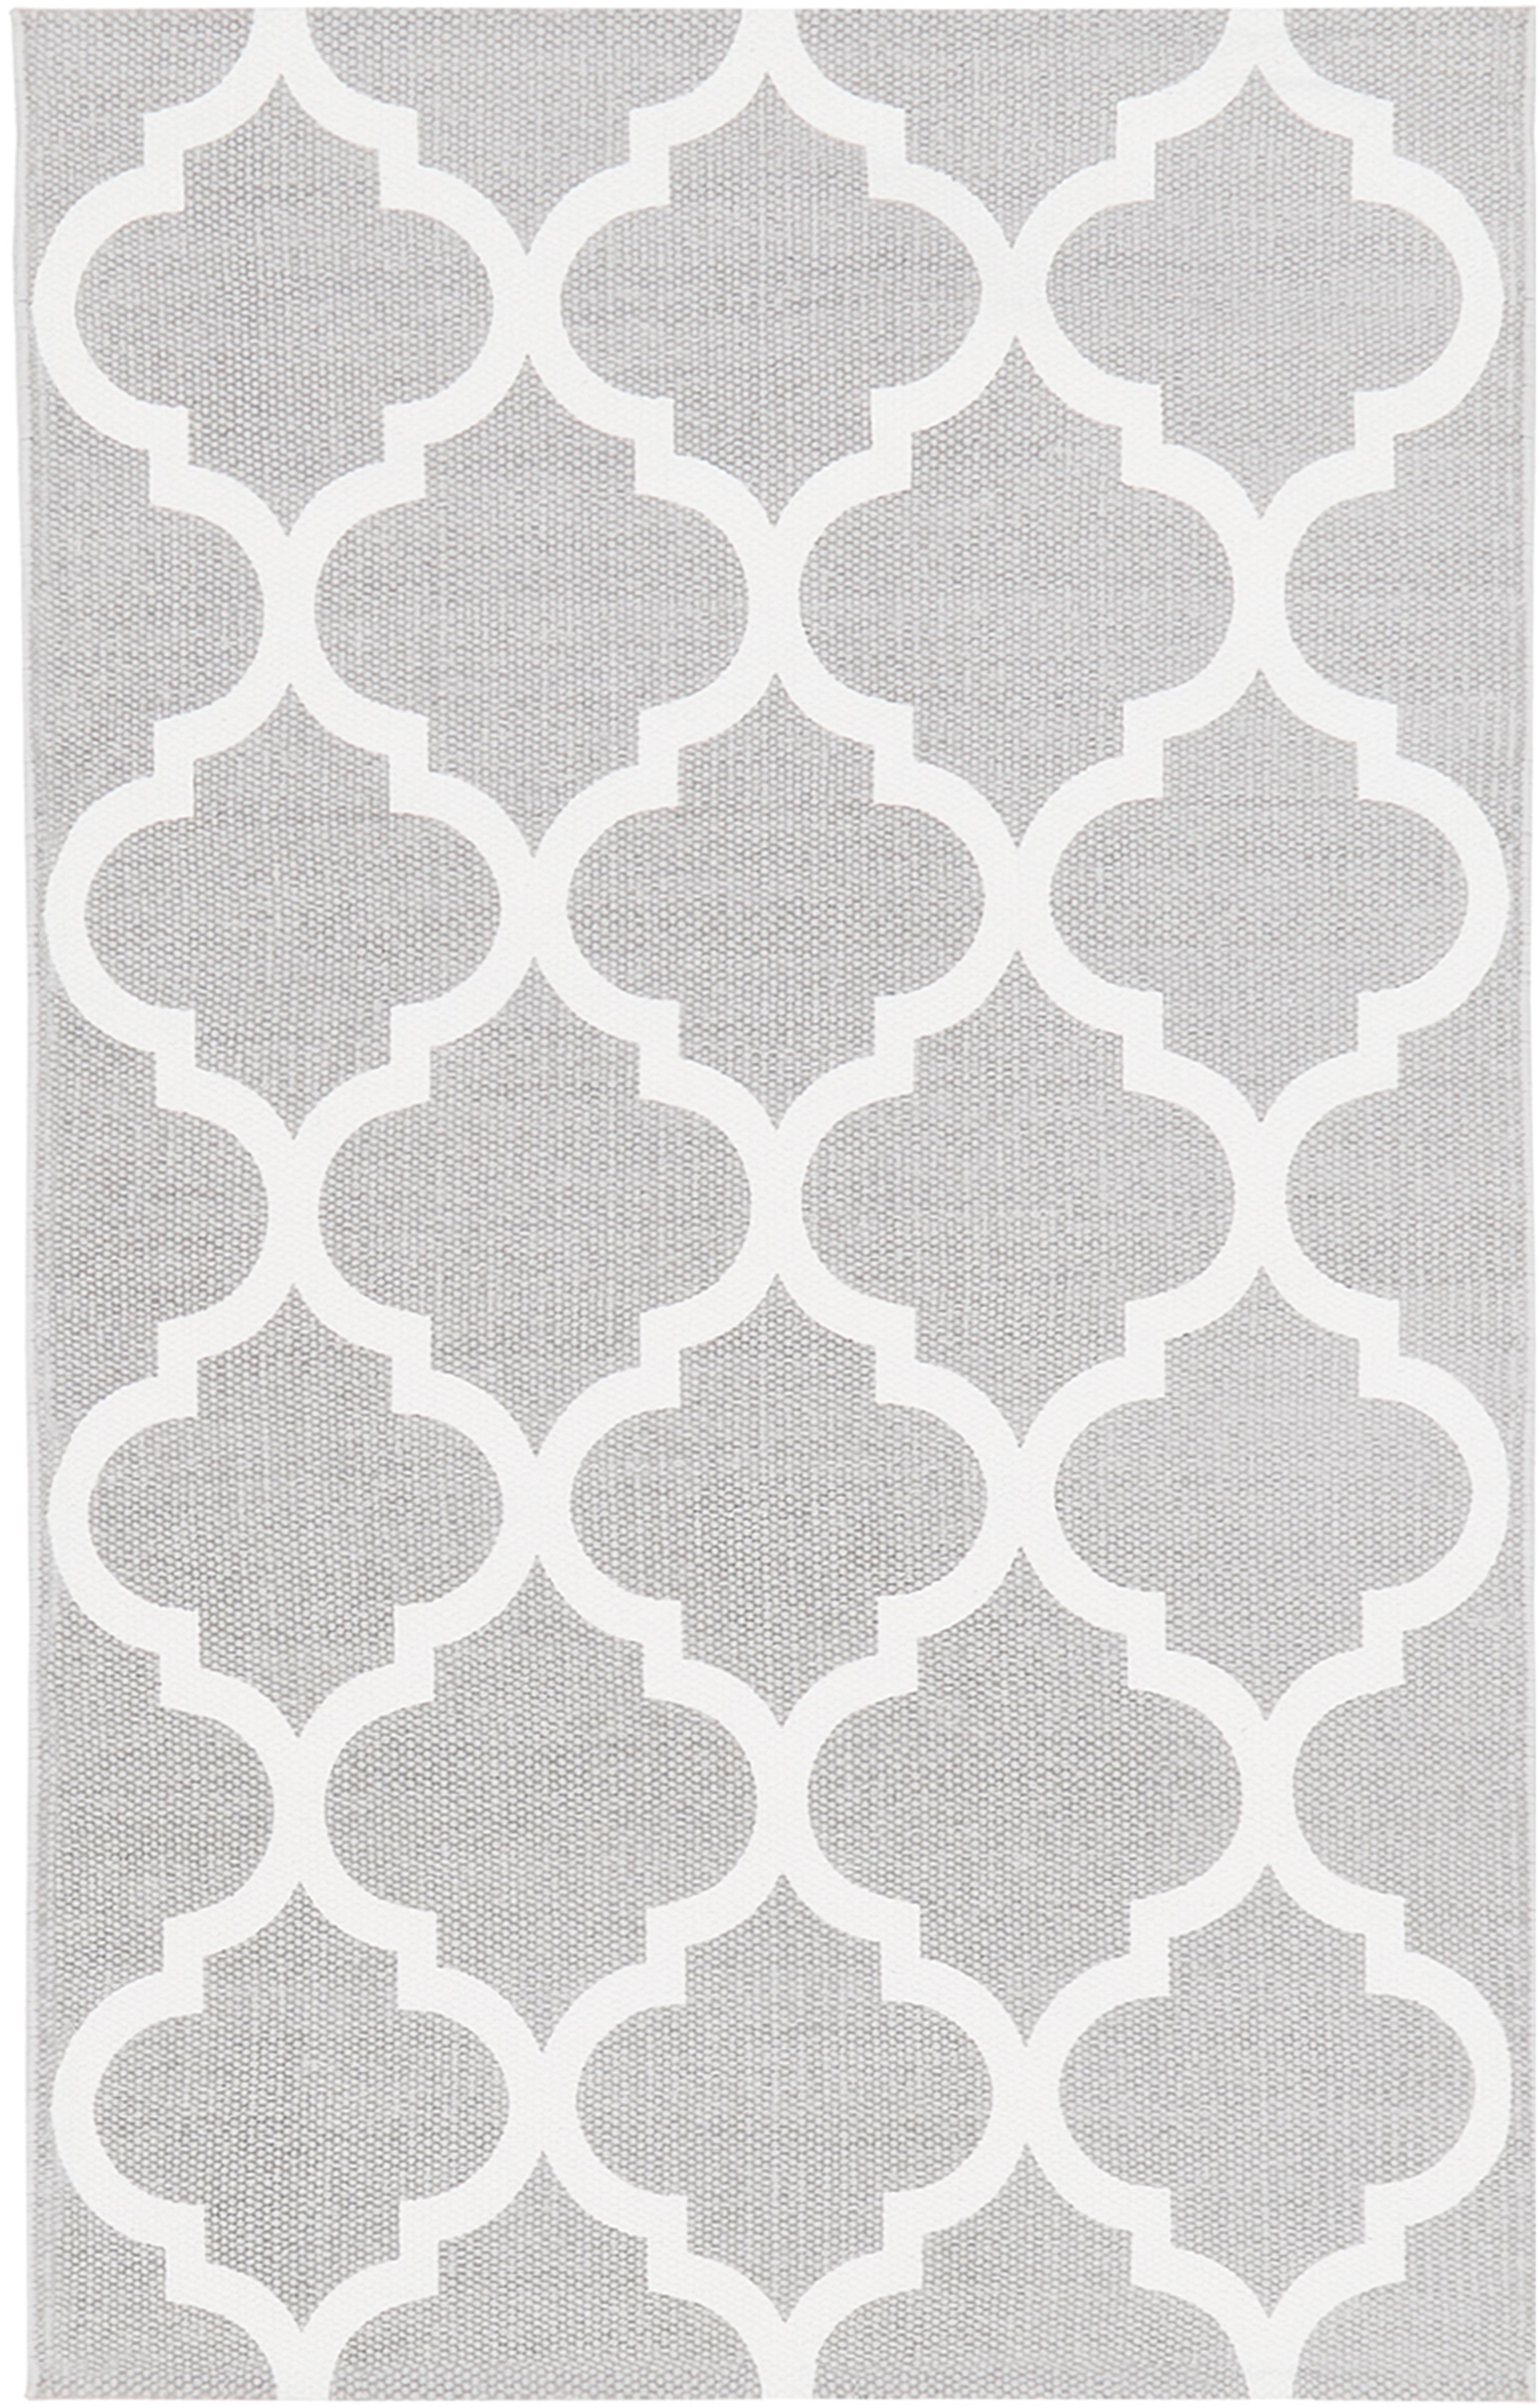 Alfombra de algodón Amira, 100%algodón, Gris claro, crema, An 50 x L 80 cm (Tamaño XXS)